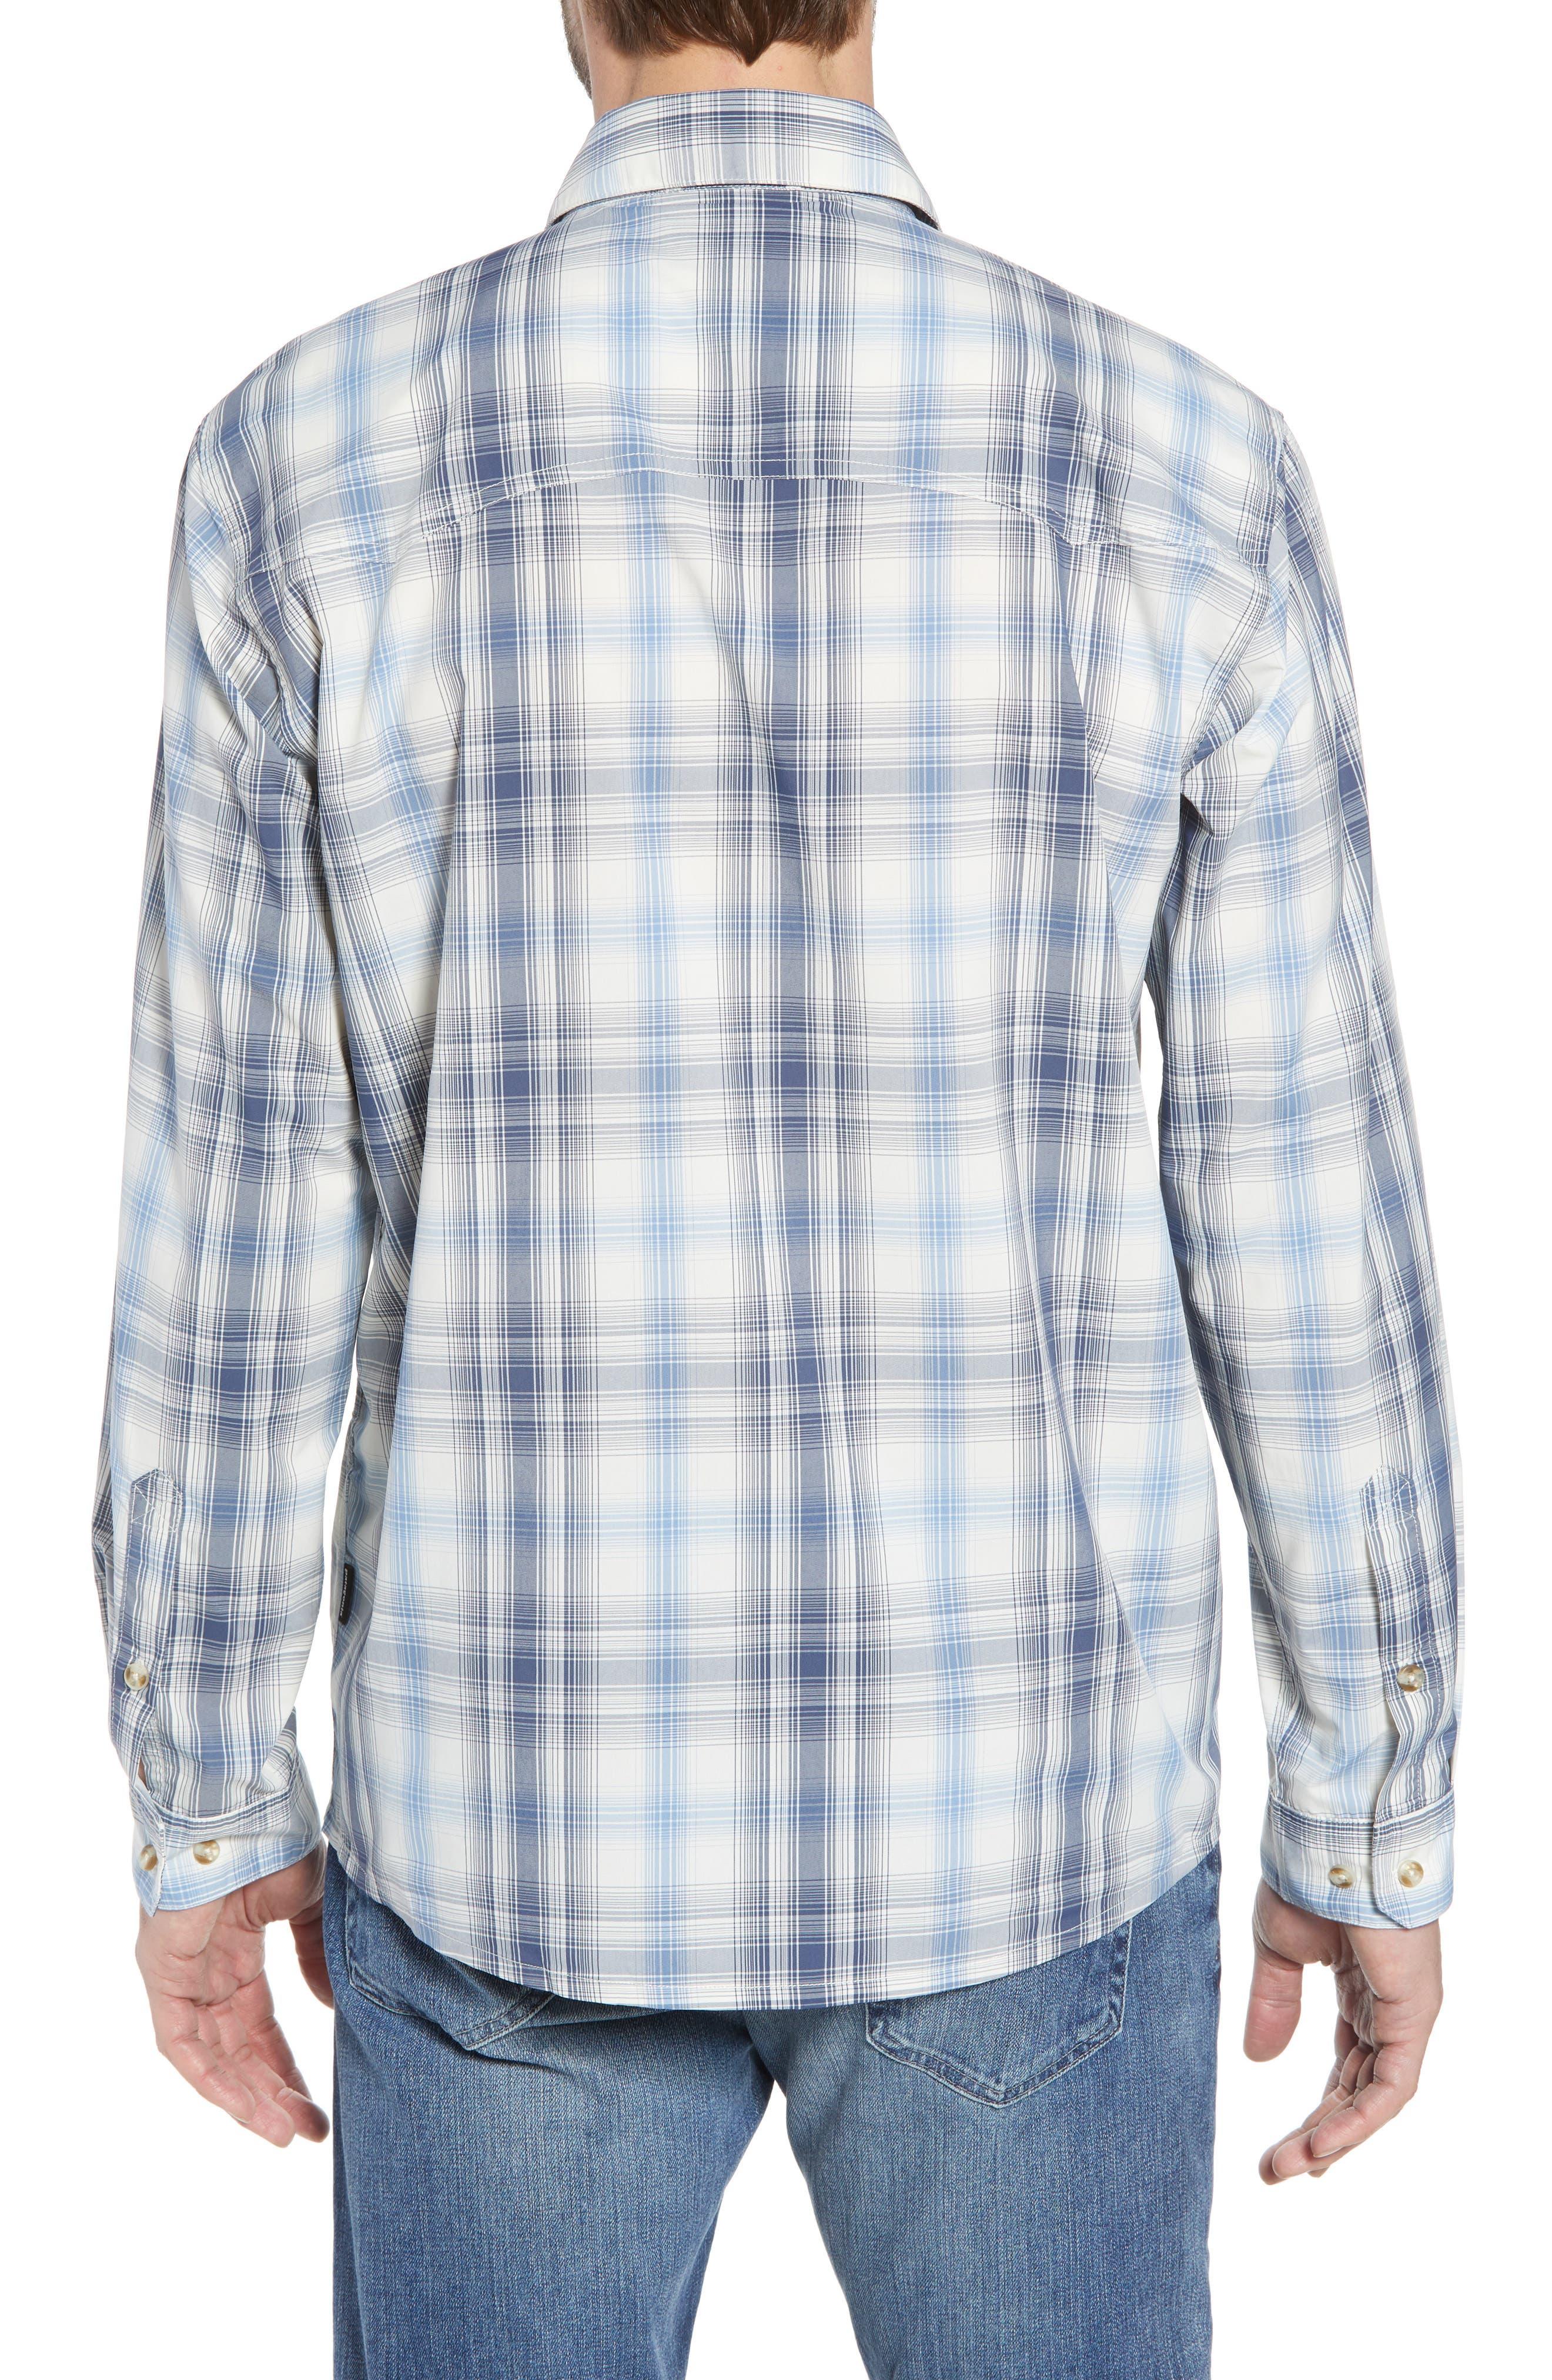 Regular Fit Plaid Sport Shirt,                             Alternate thumbnail 2, color,                             405